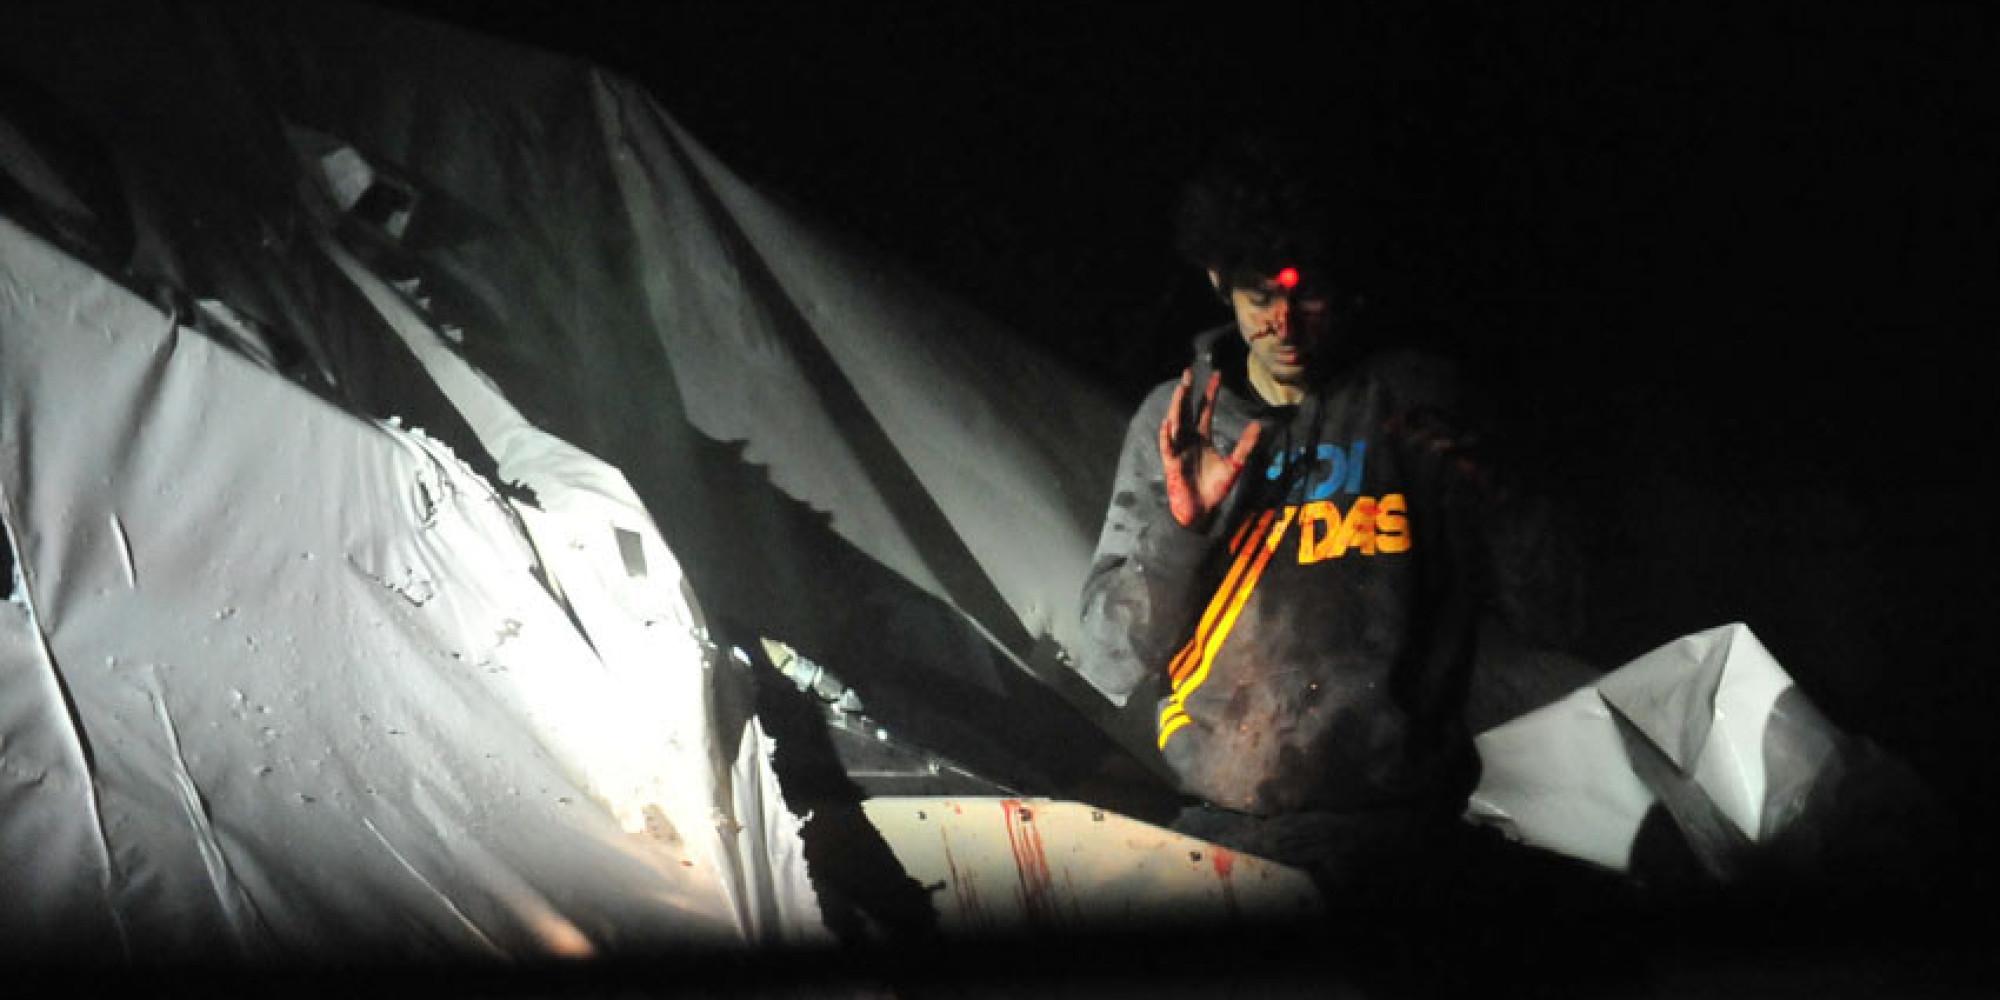 Boston Bombing Suspect Dzhokhar Tsarnaev